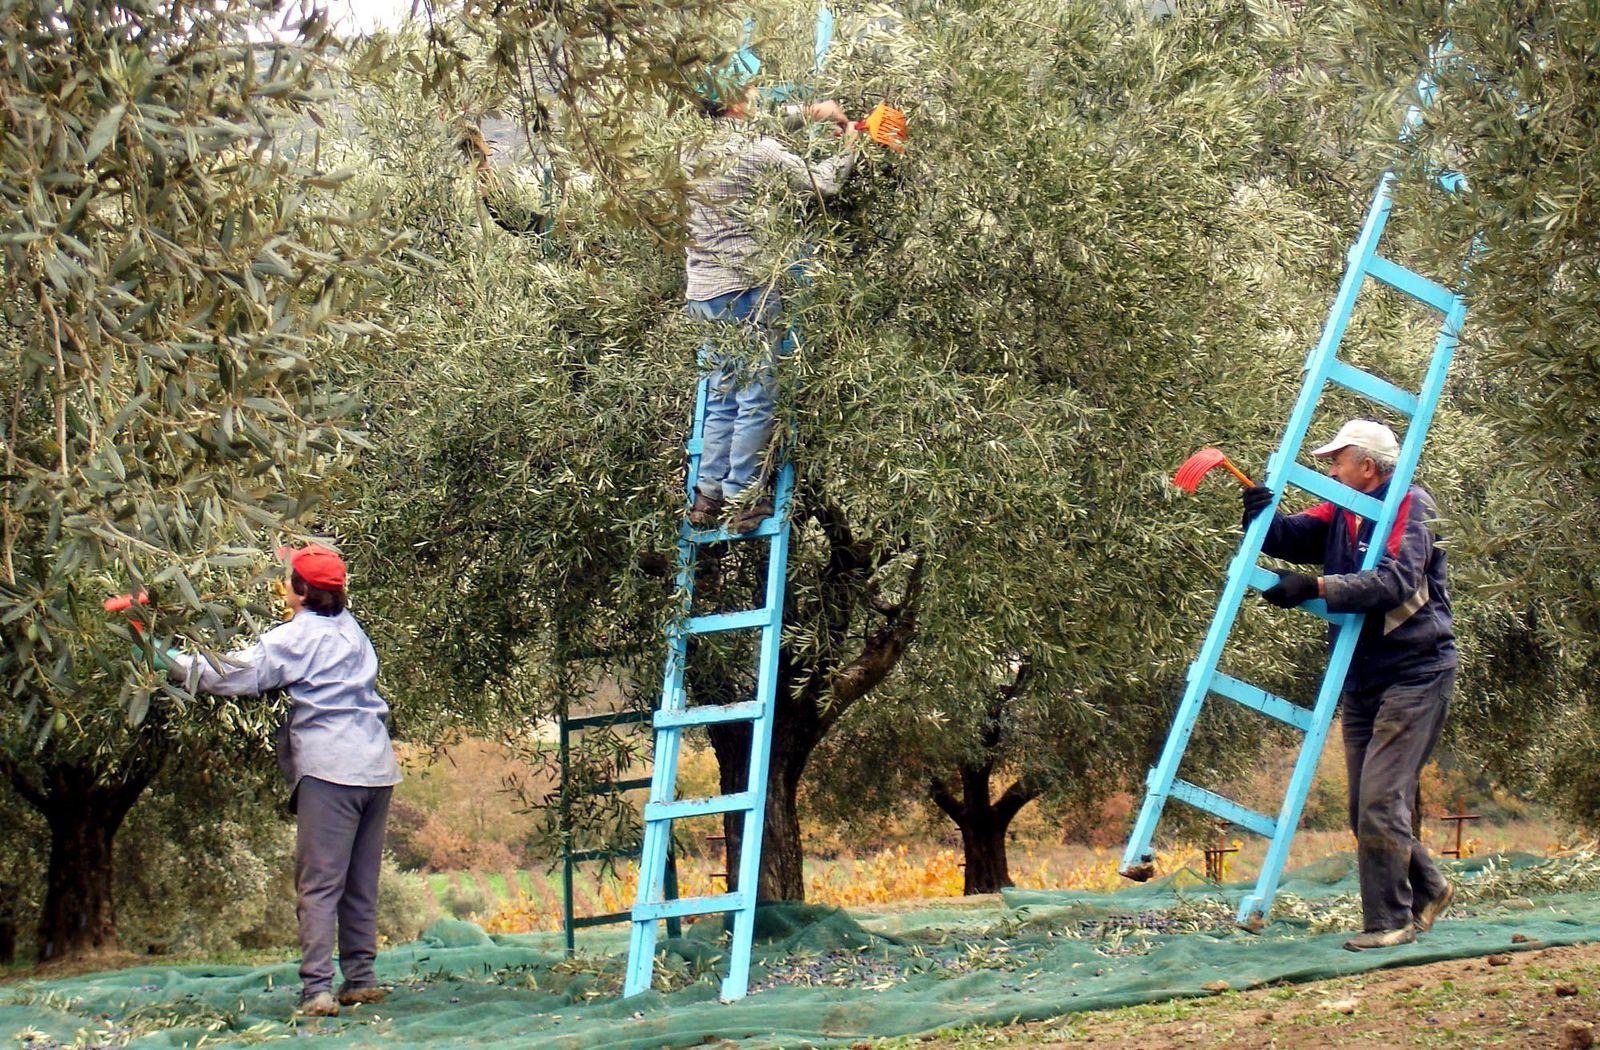 Olivenöl / Olivenernte in Griechenland / Oliven / Olivenernte